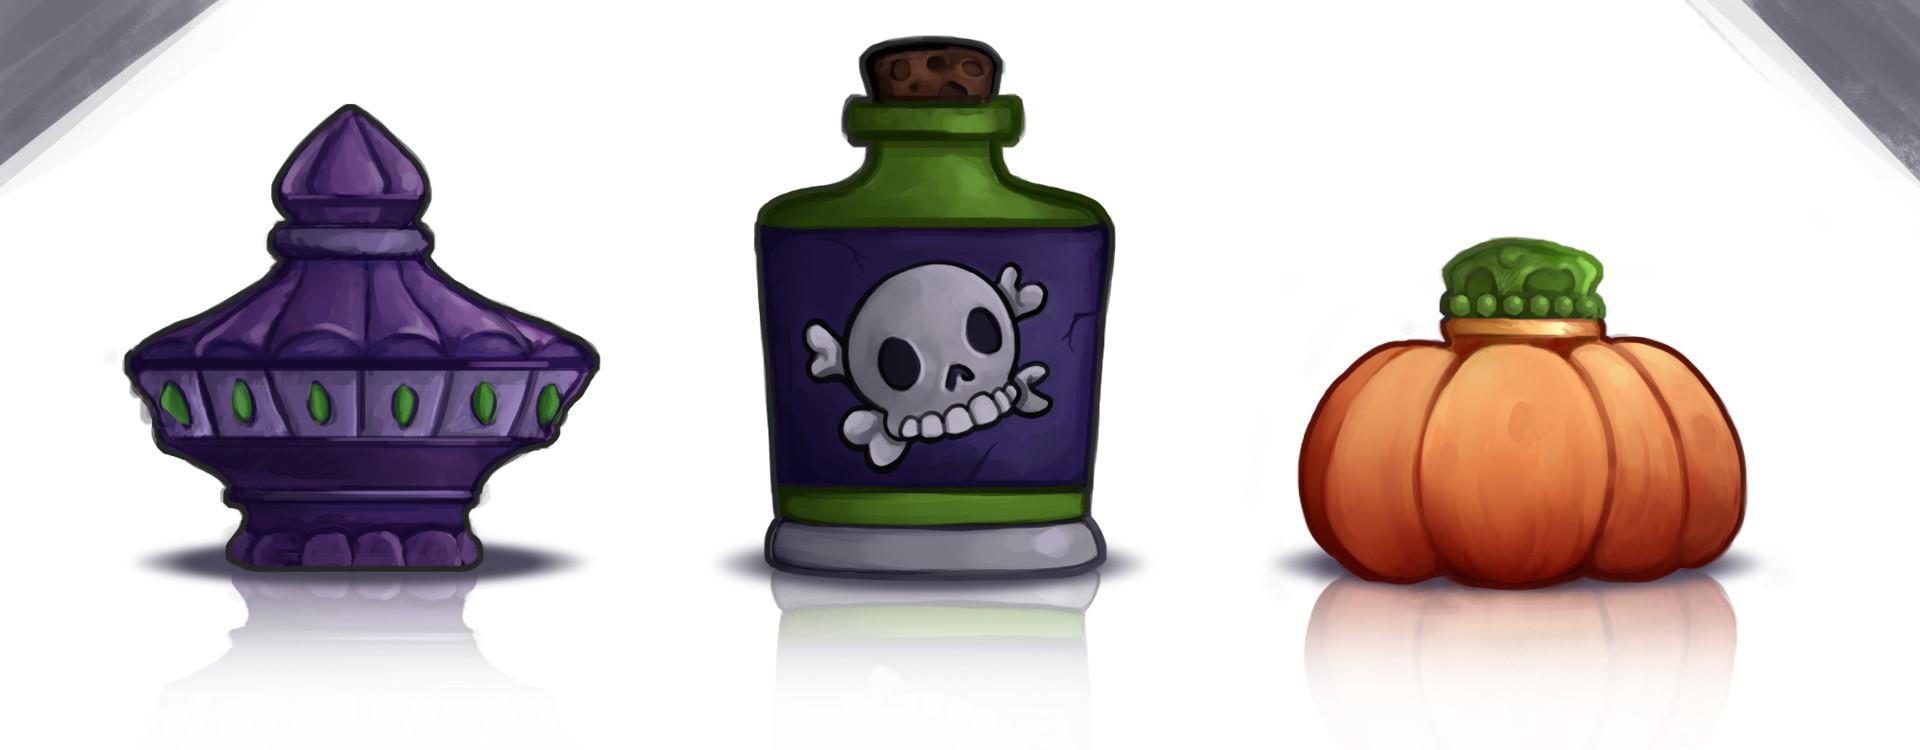 Rebecca smith potions2